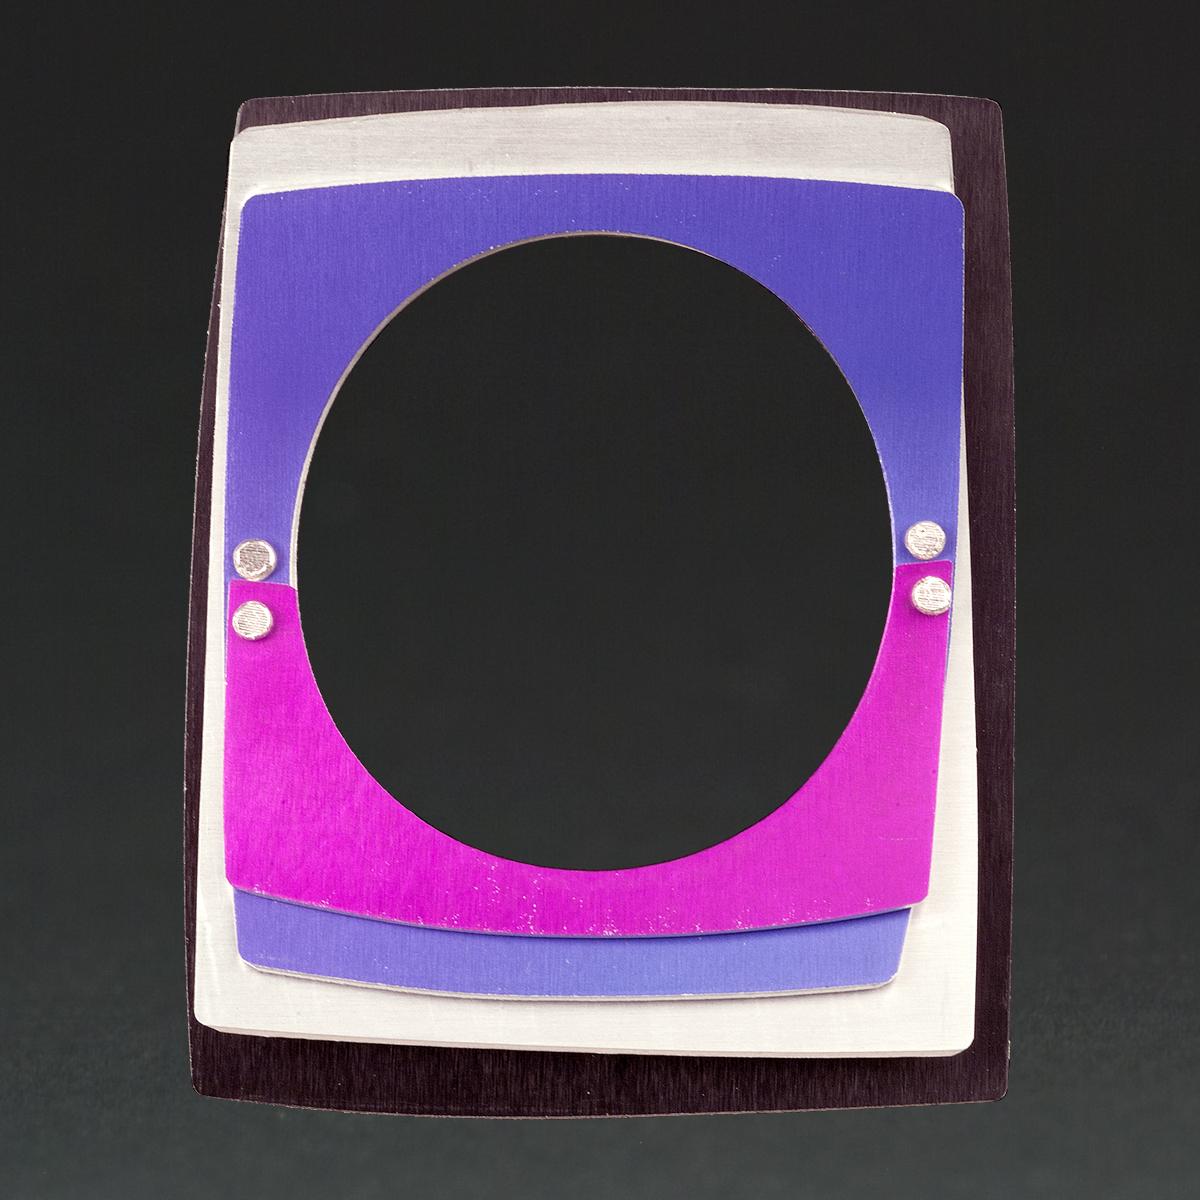 B - Black, Silver, Purple, Violet